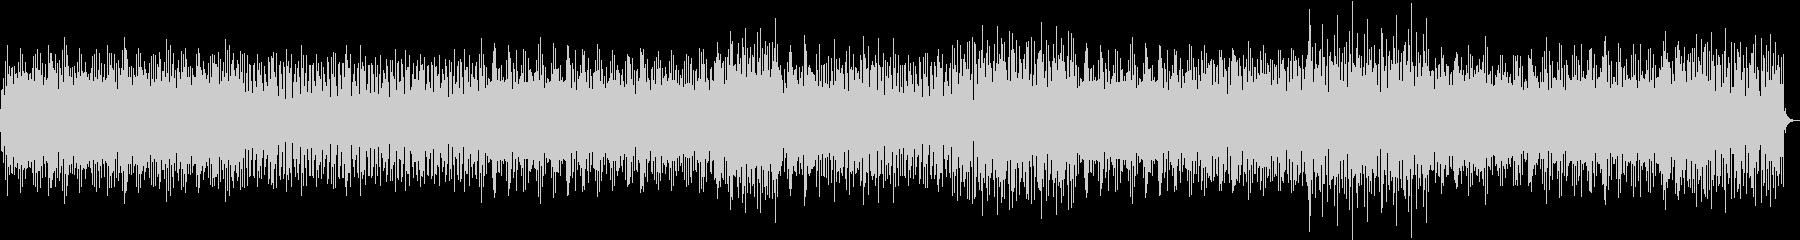 16BeatのTablaに載せたテクノ調の未再生の波形